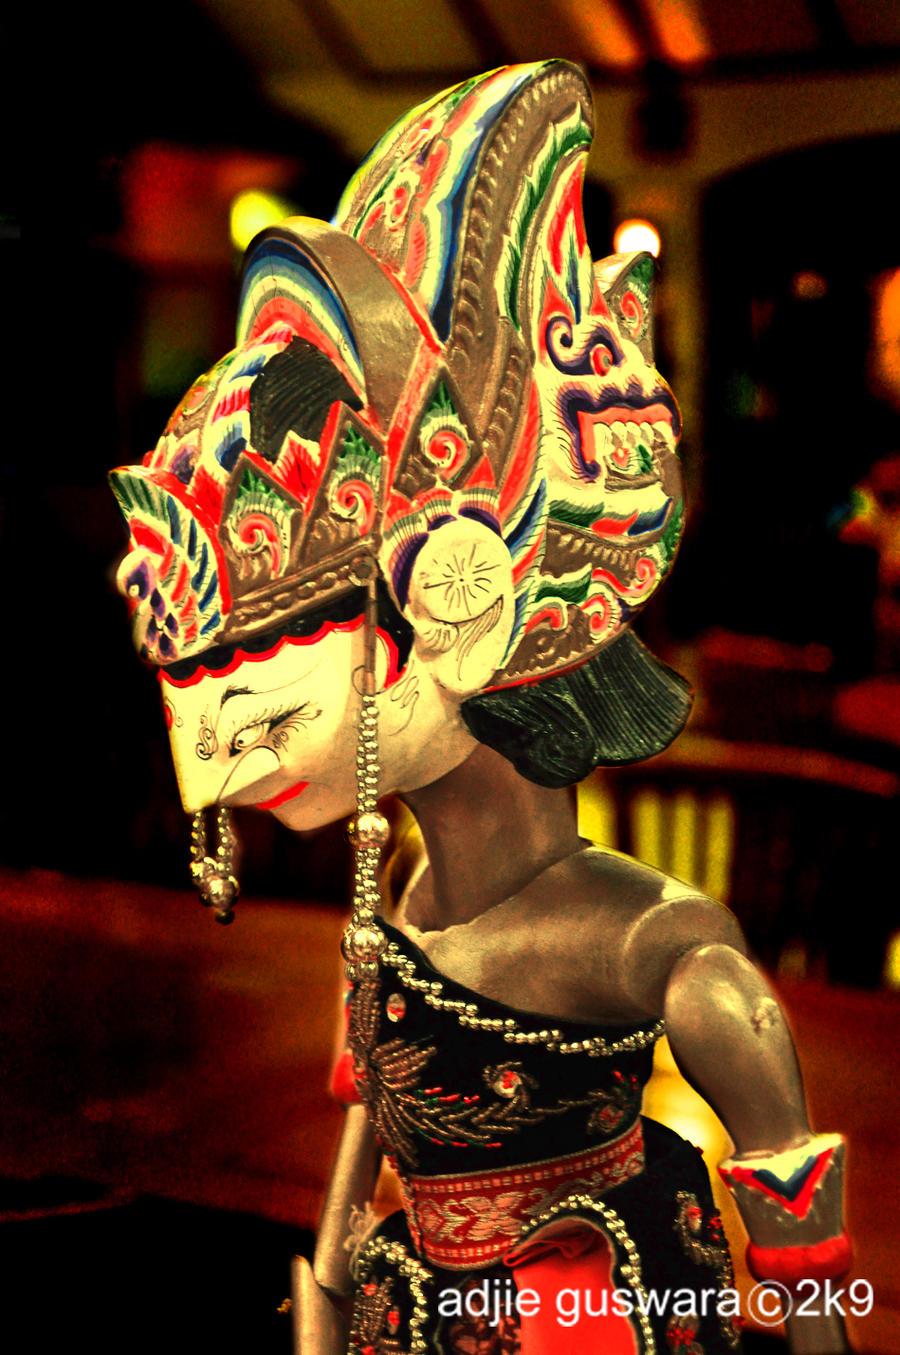 wayang golek puppet by adjieguswara-art on DeviantArt